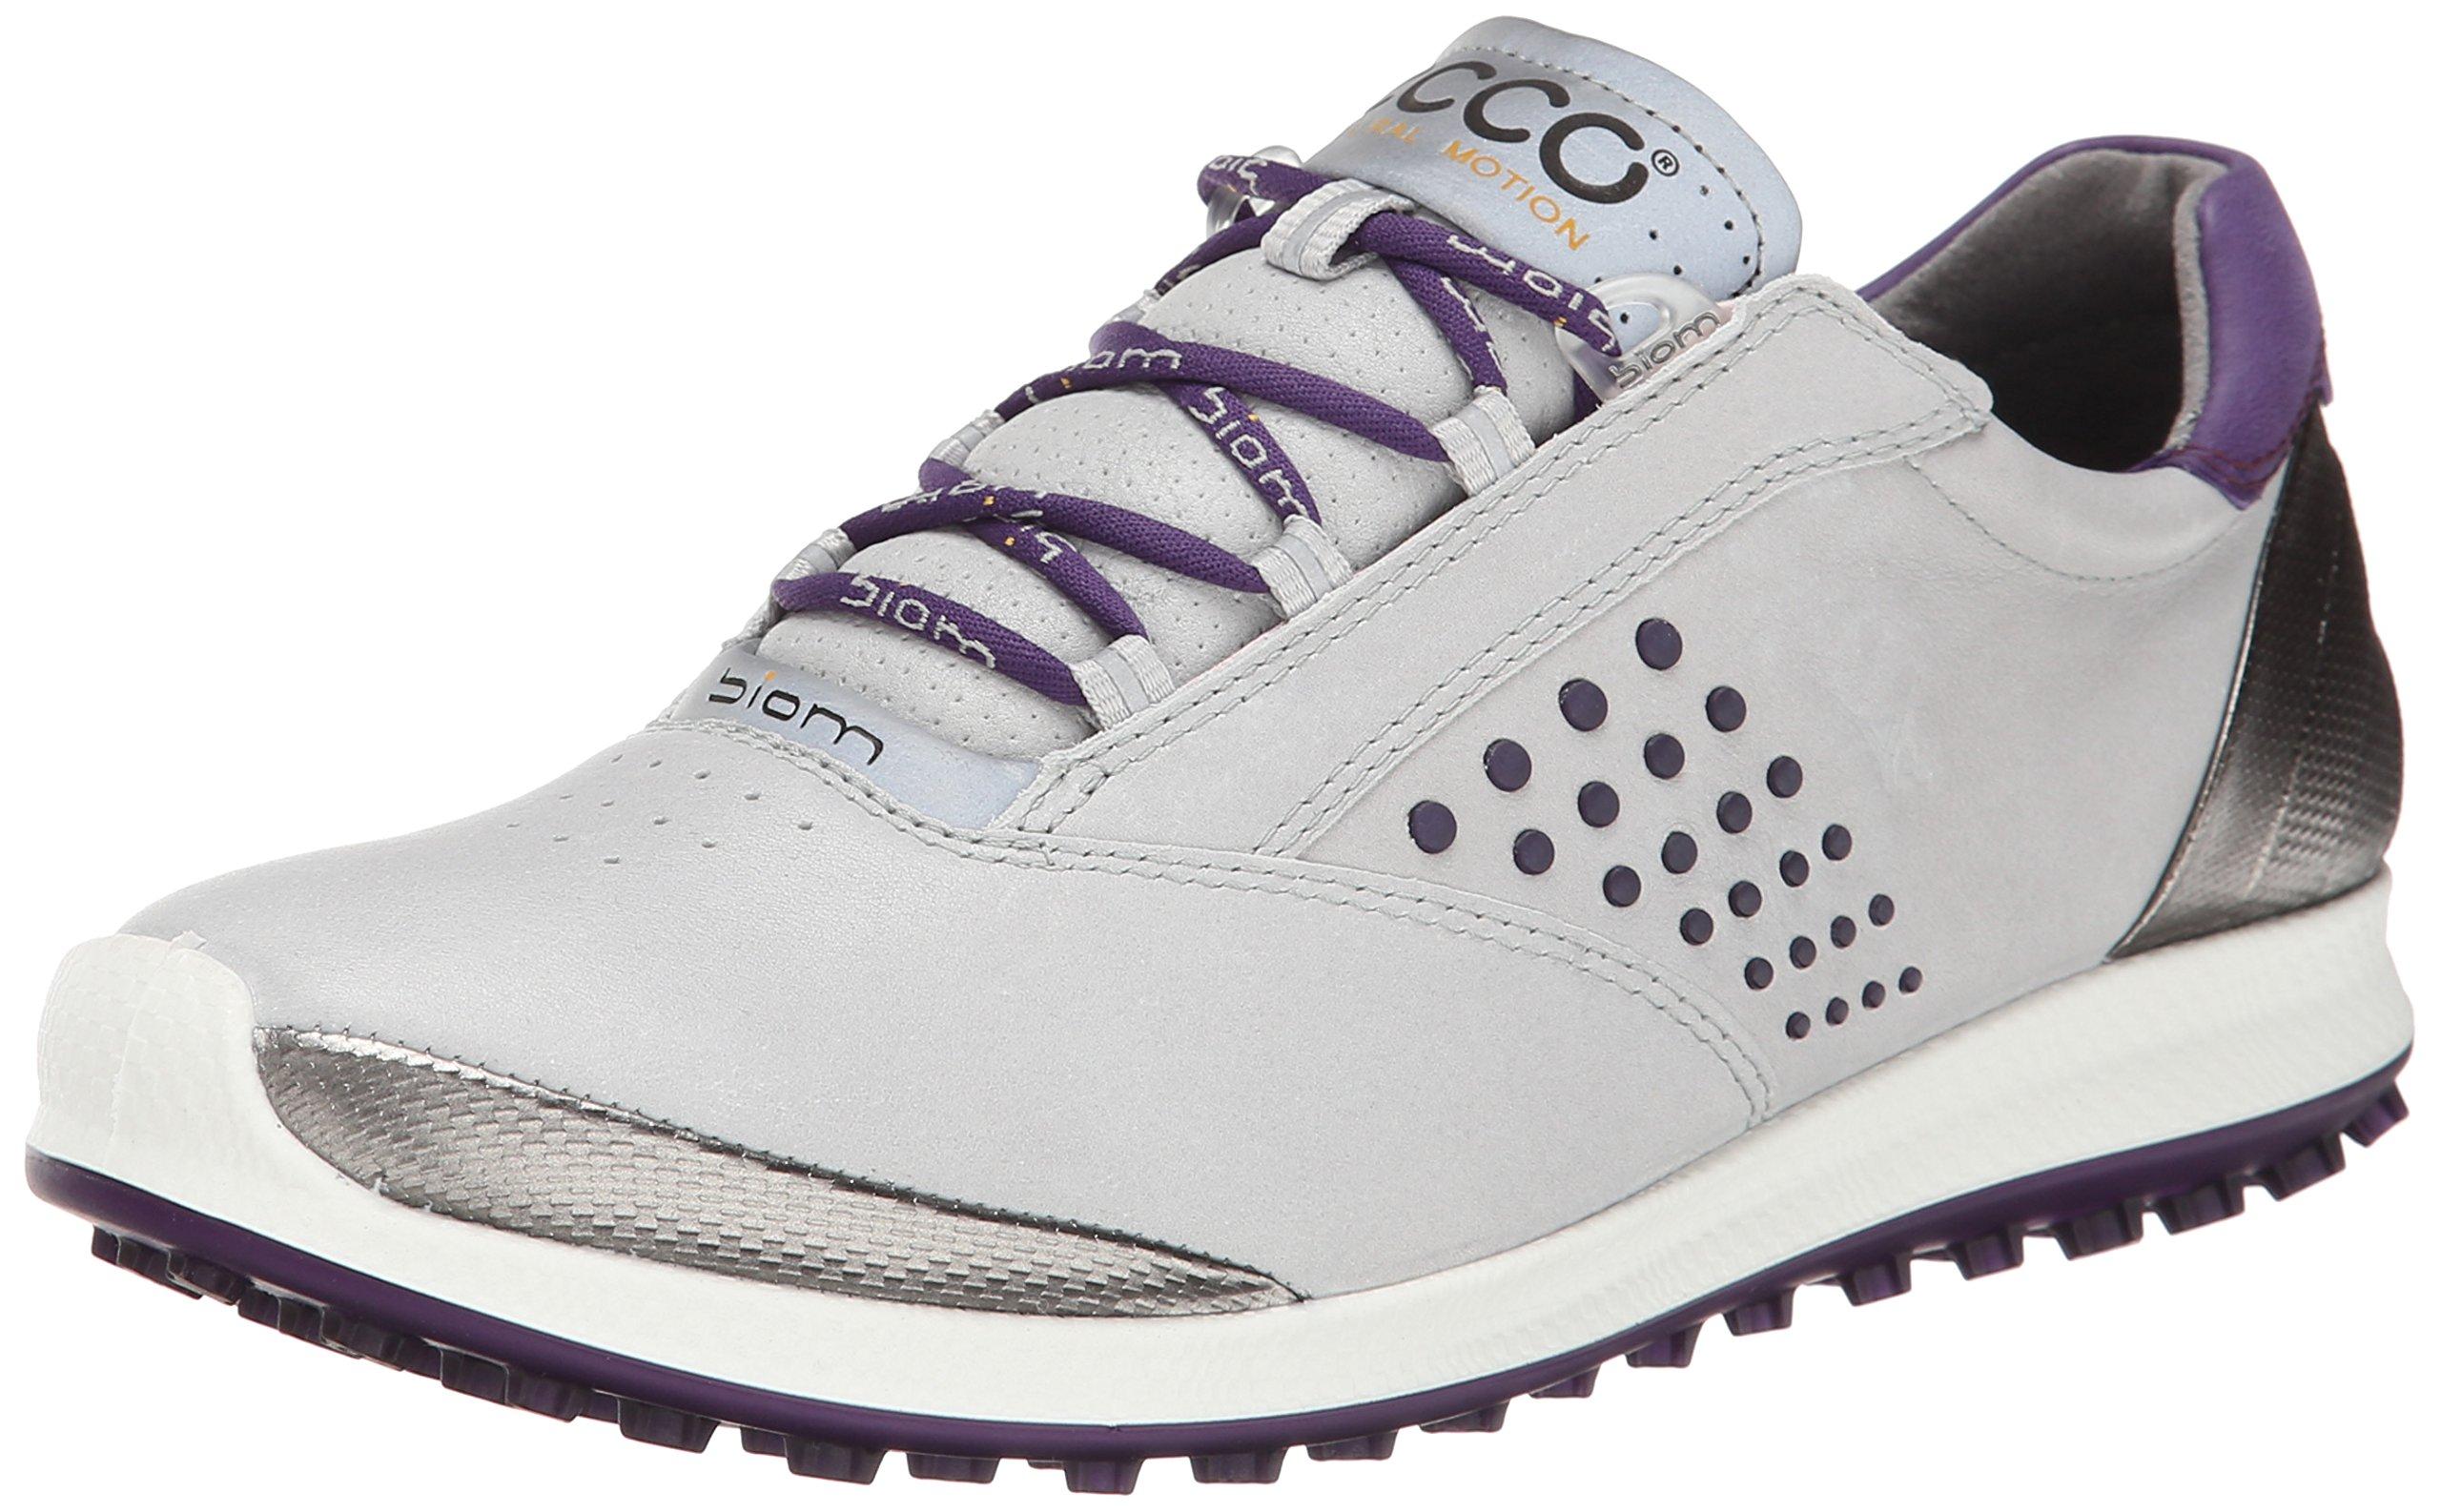 ECCO Women's Biom Hybrid 2 Golf Shoe,Concrete/Imperial Purple,41 EU/10-10.5 M US